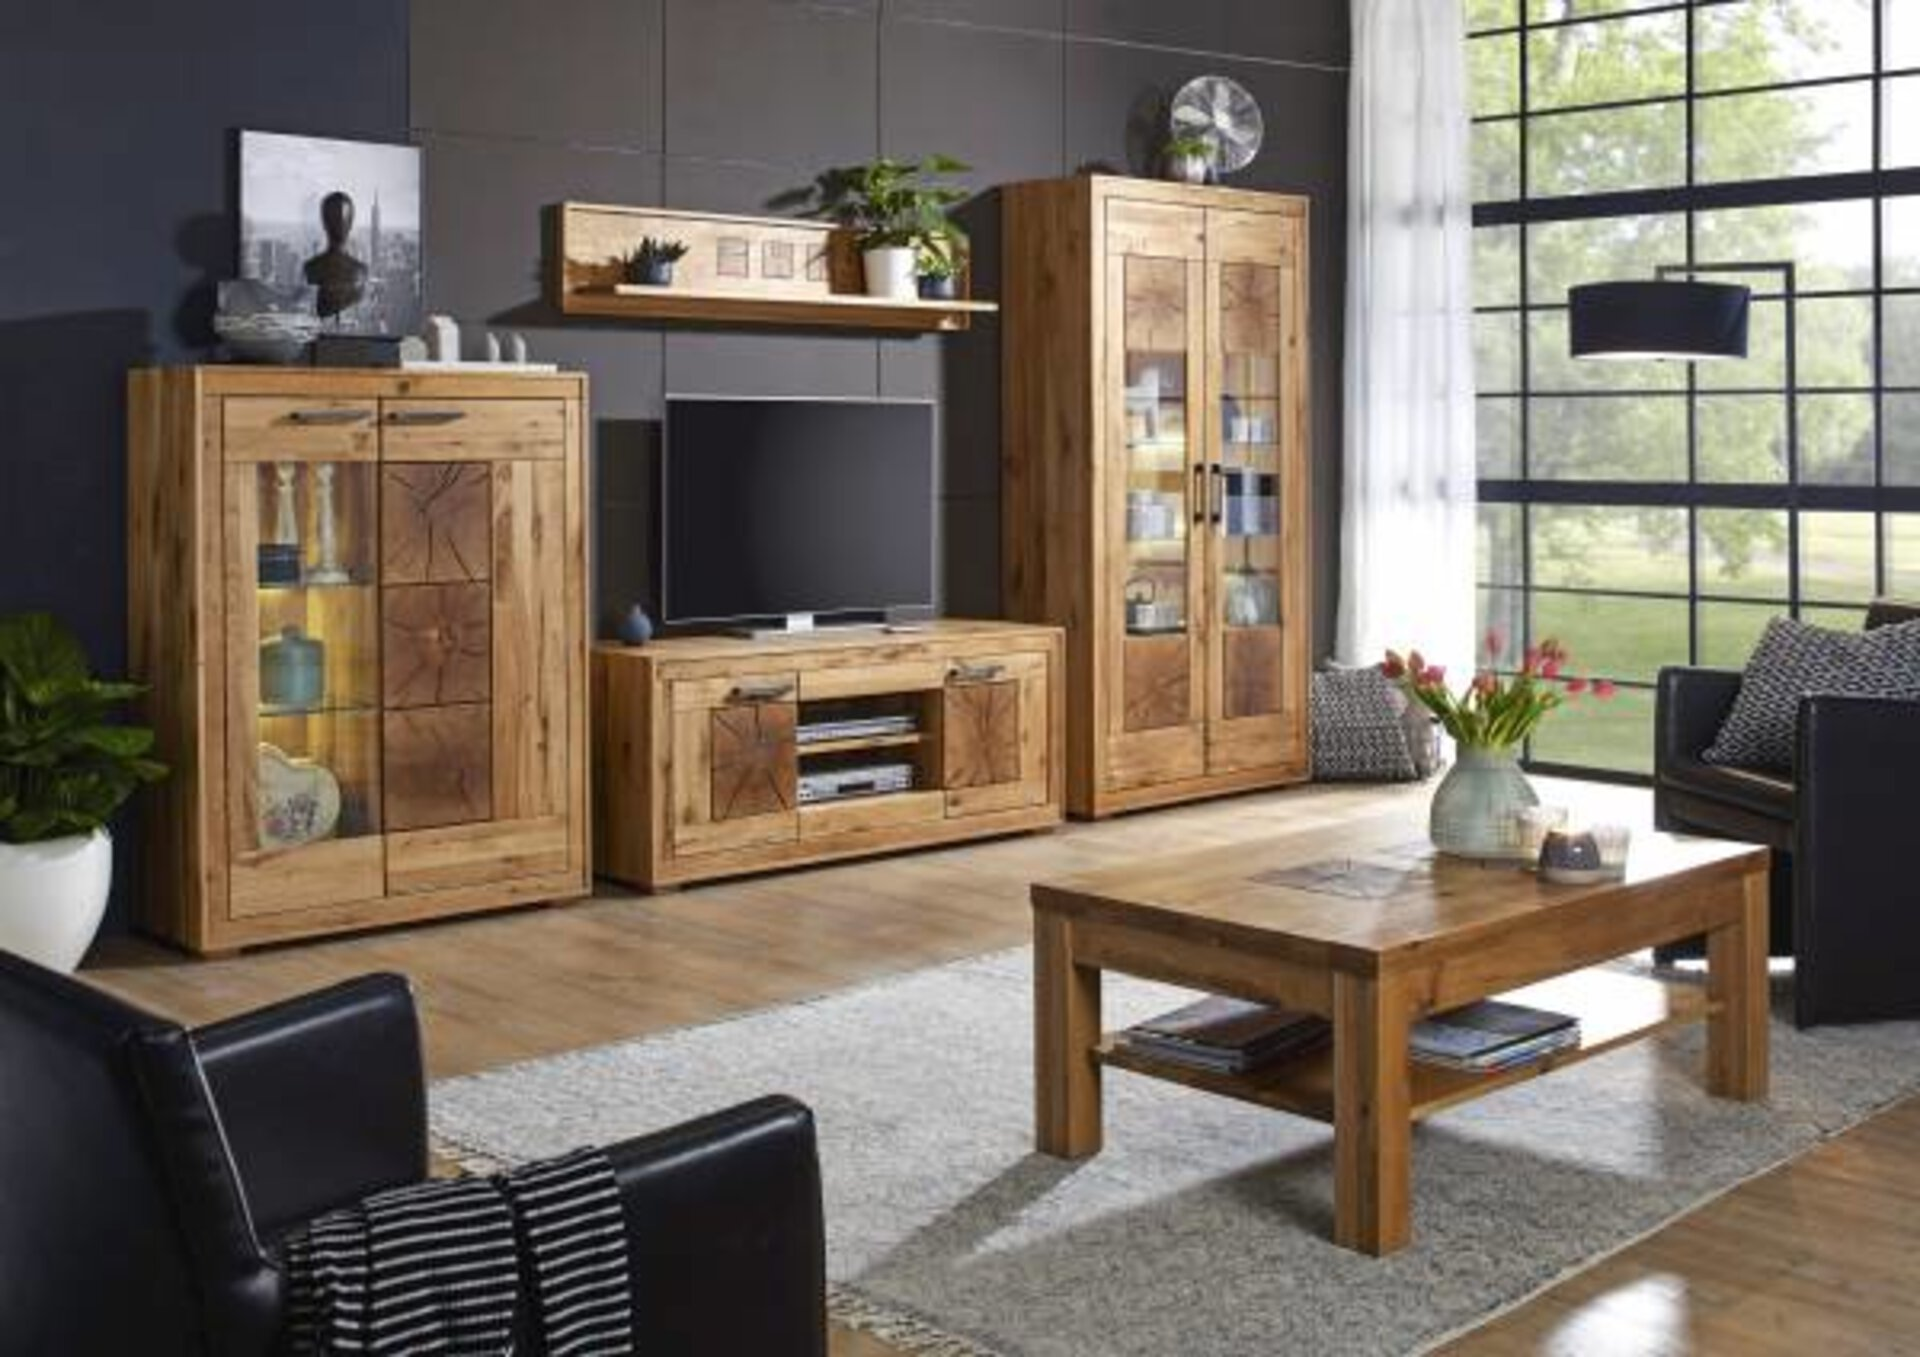 Vitrine WZ-0315 CELECT Holz mehrfarbig 40 x 201 x 106 cm